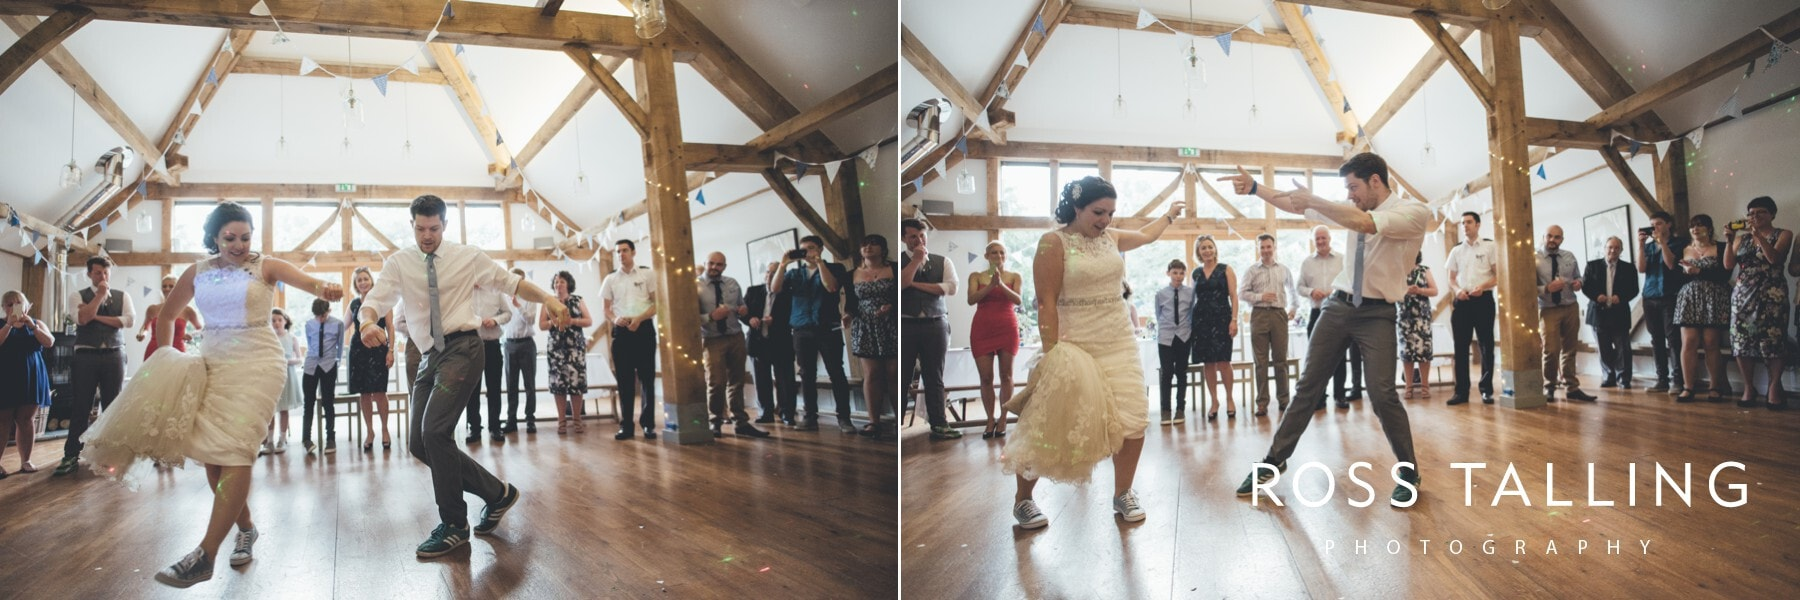 Coolest First Dance Ever Breakdancing Bride and Groom Jasmin and Ben Barnicoat_0002